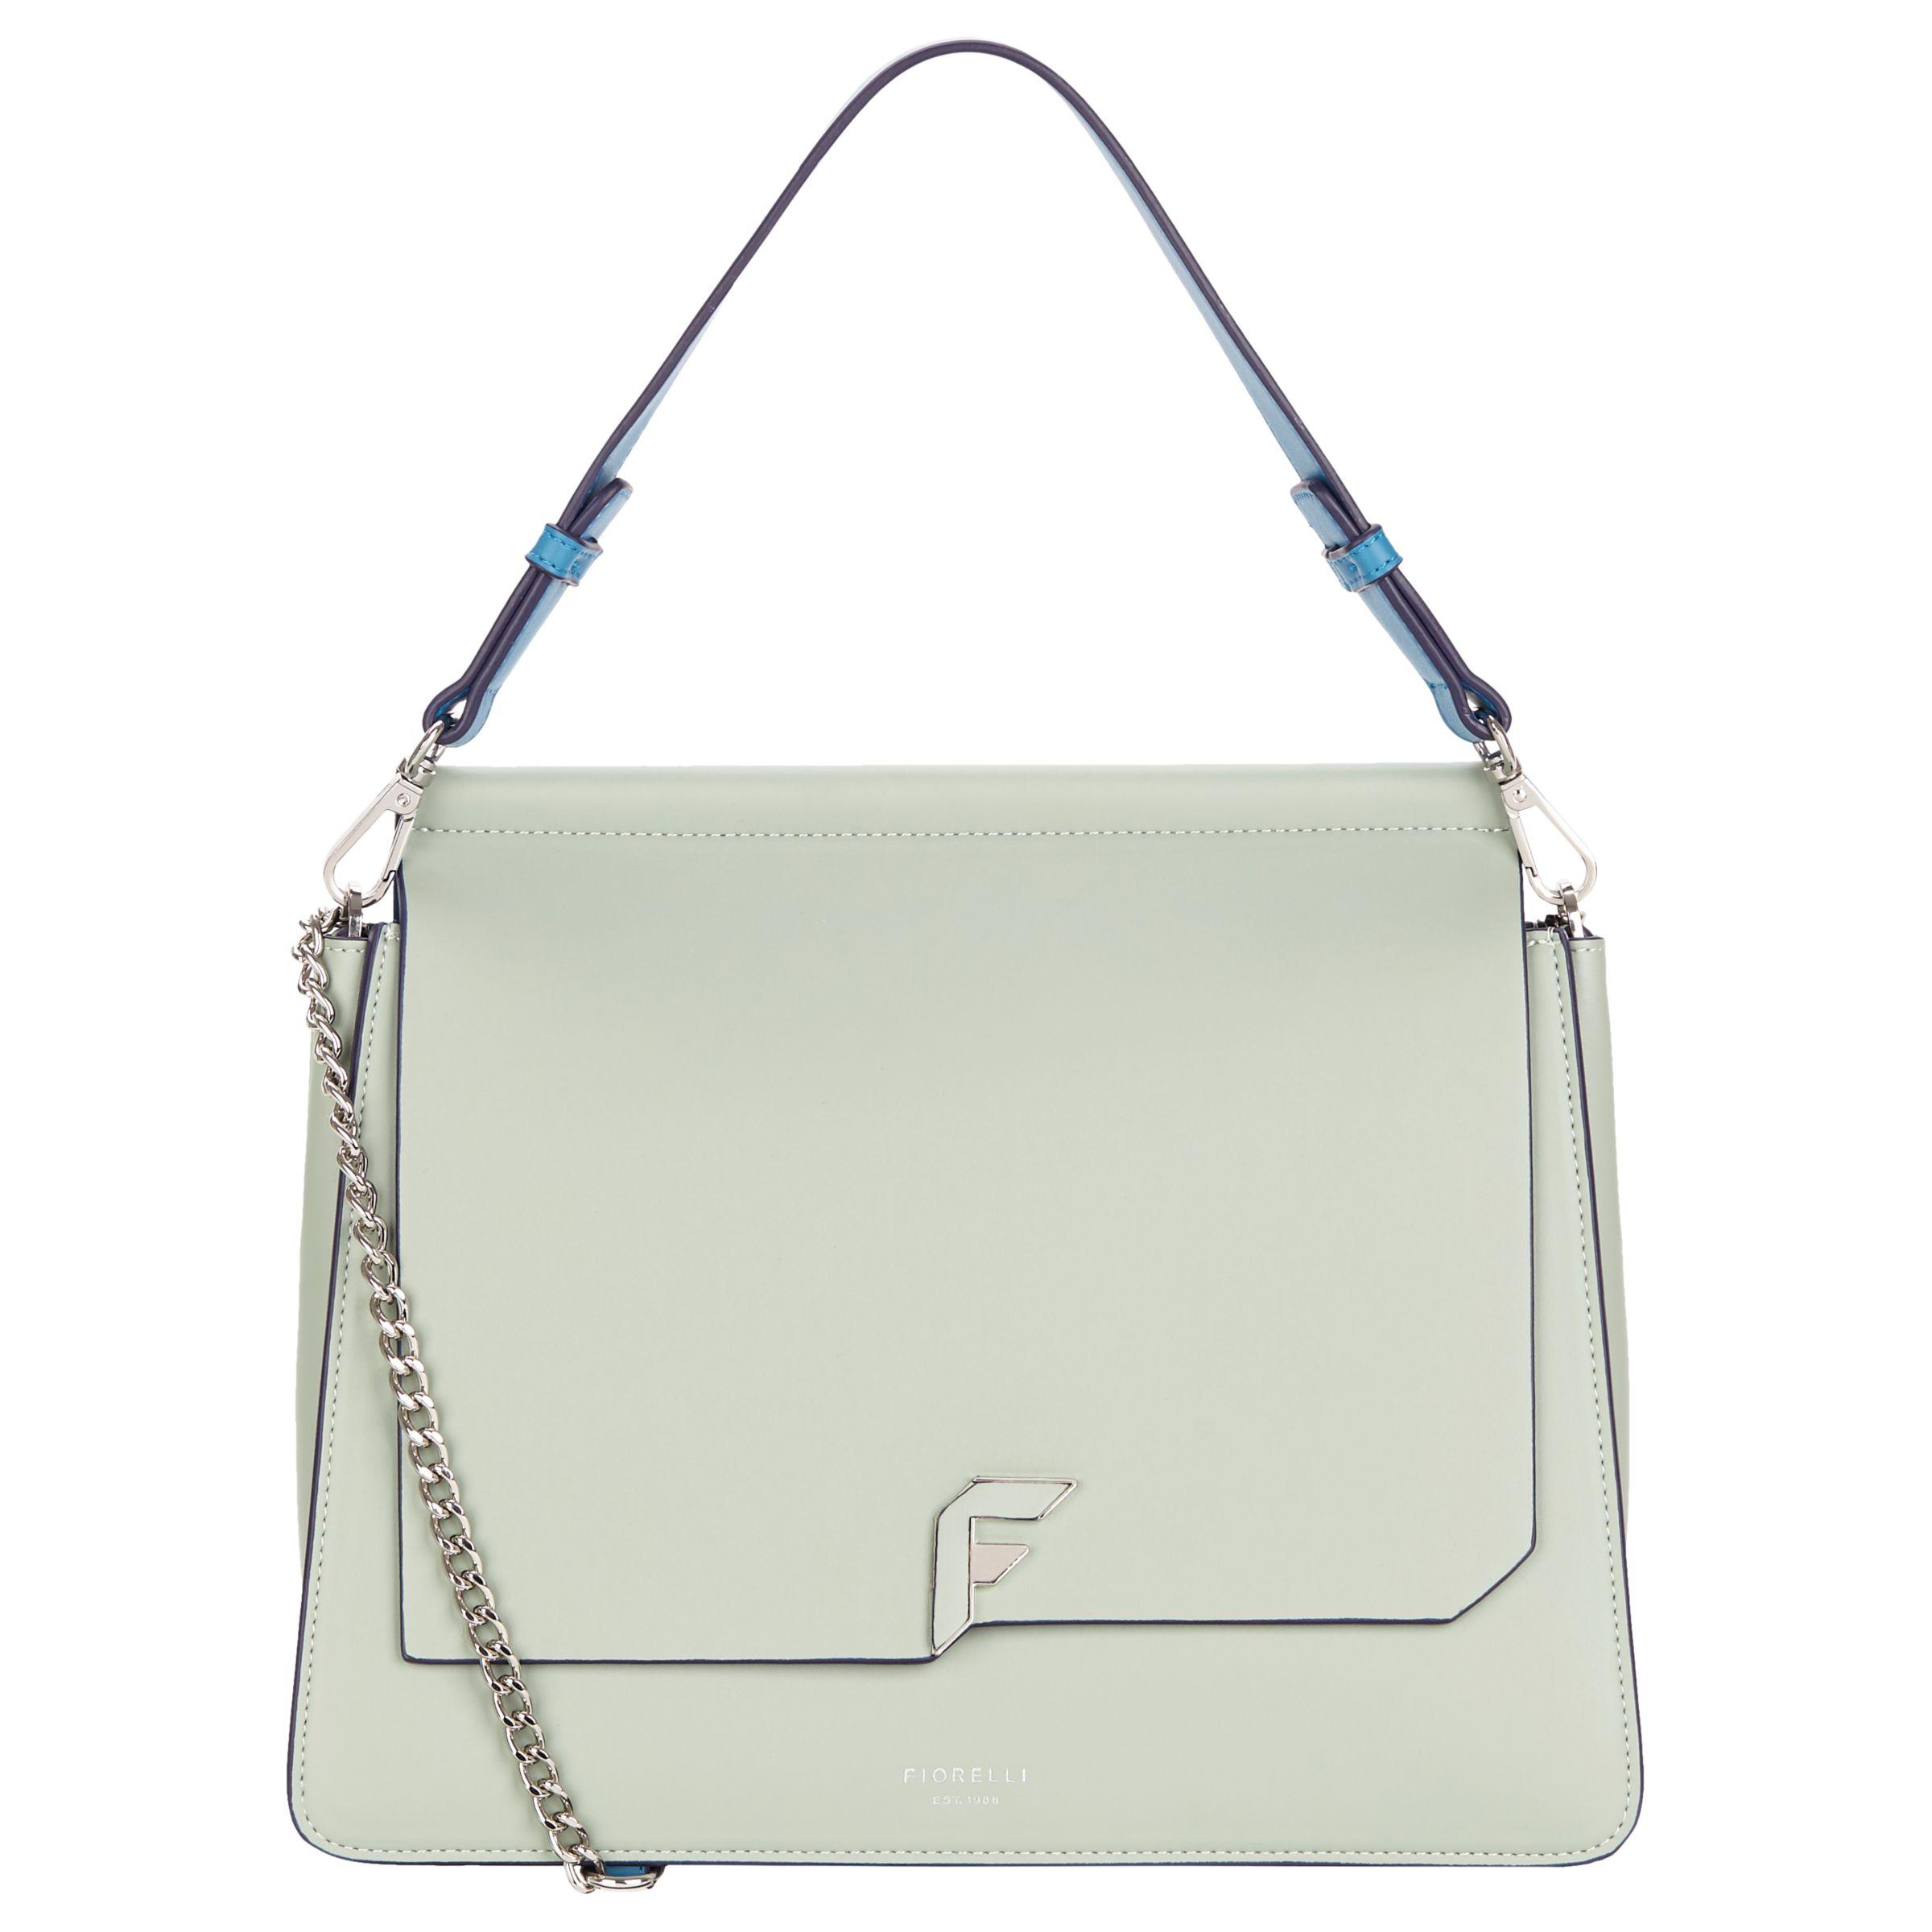 Fiorelli Fiorelli Tilly Shoulder Bag